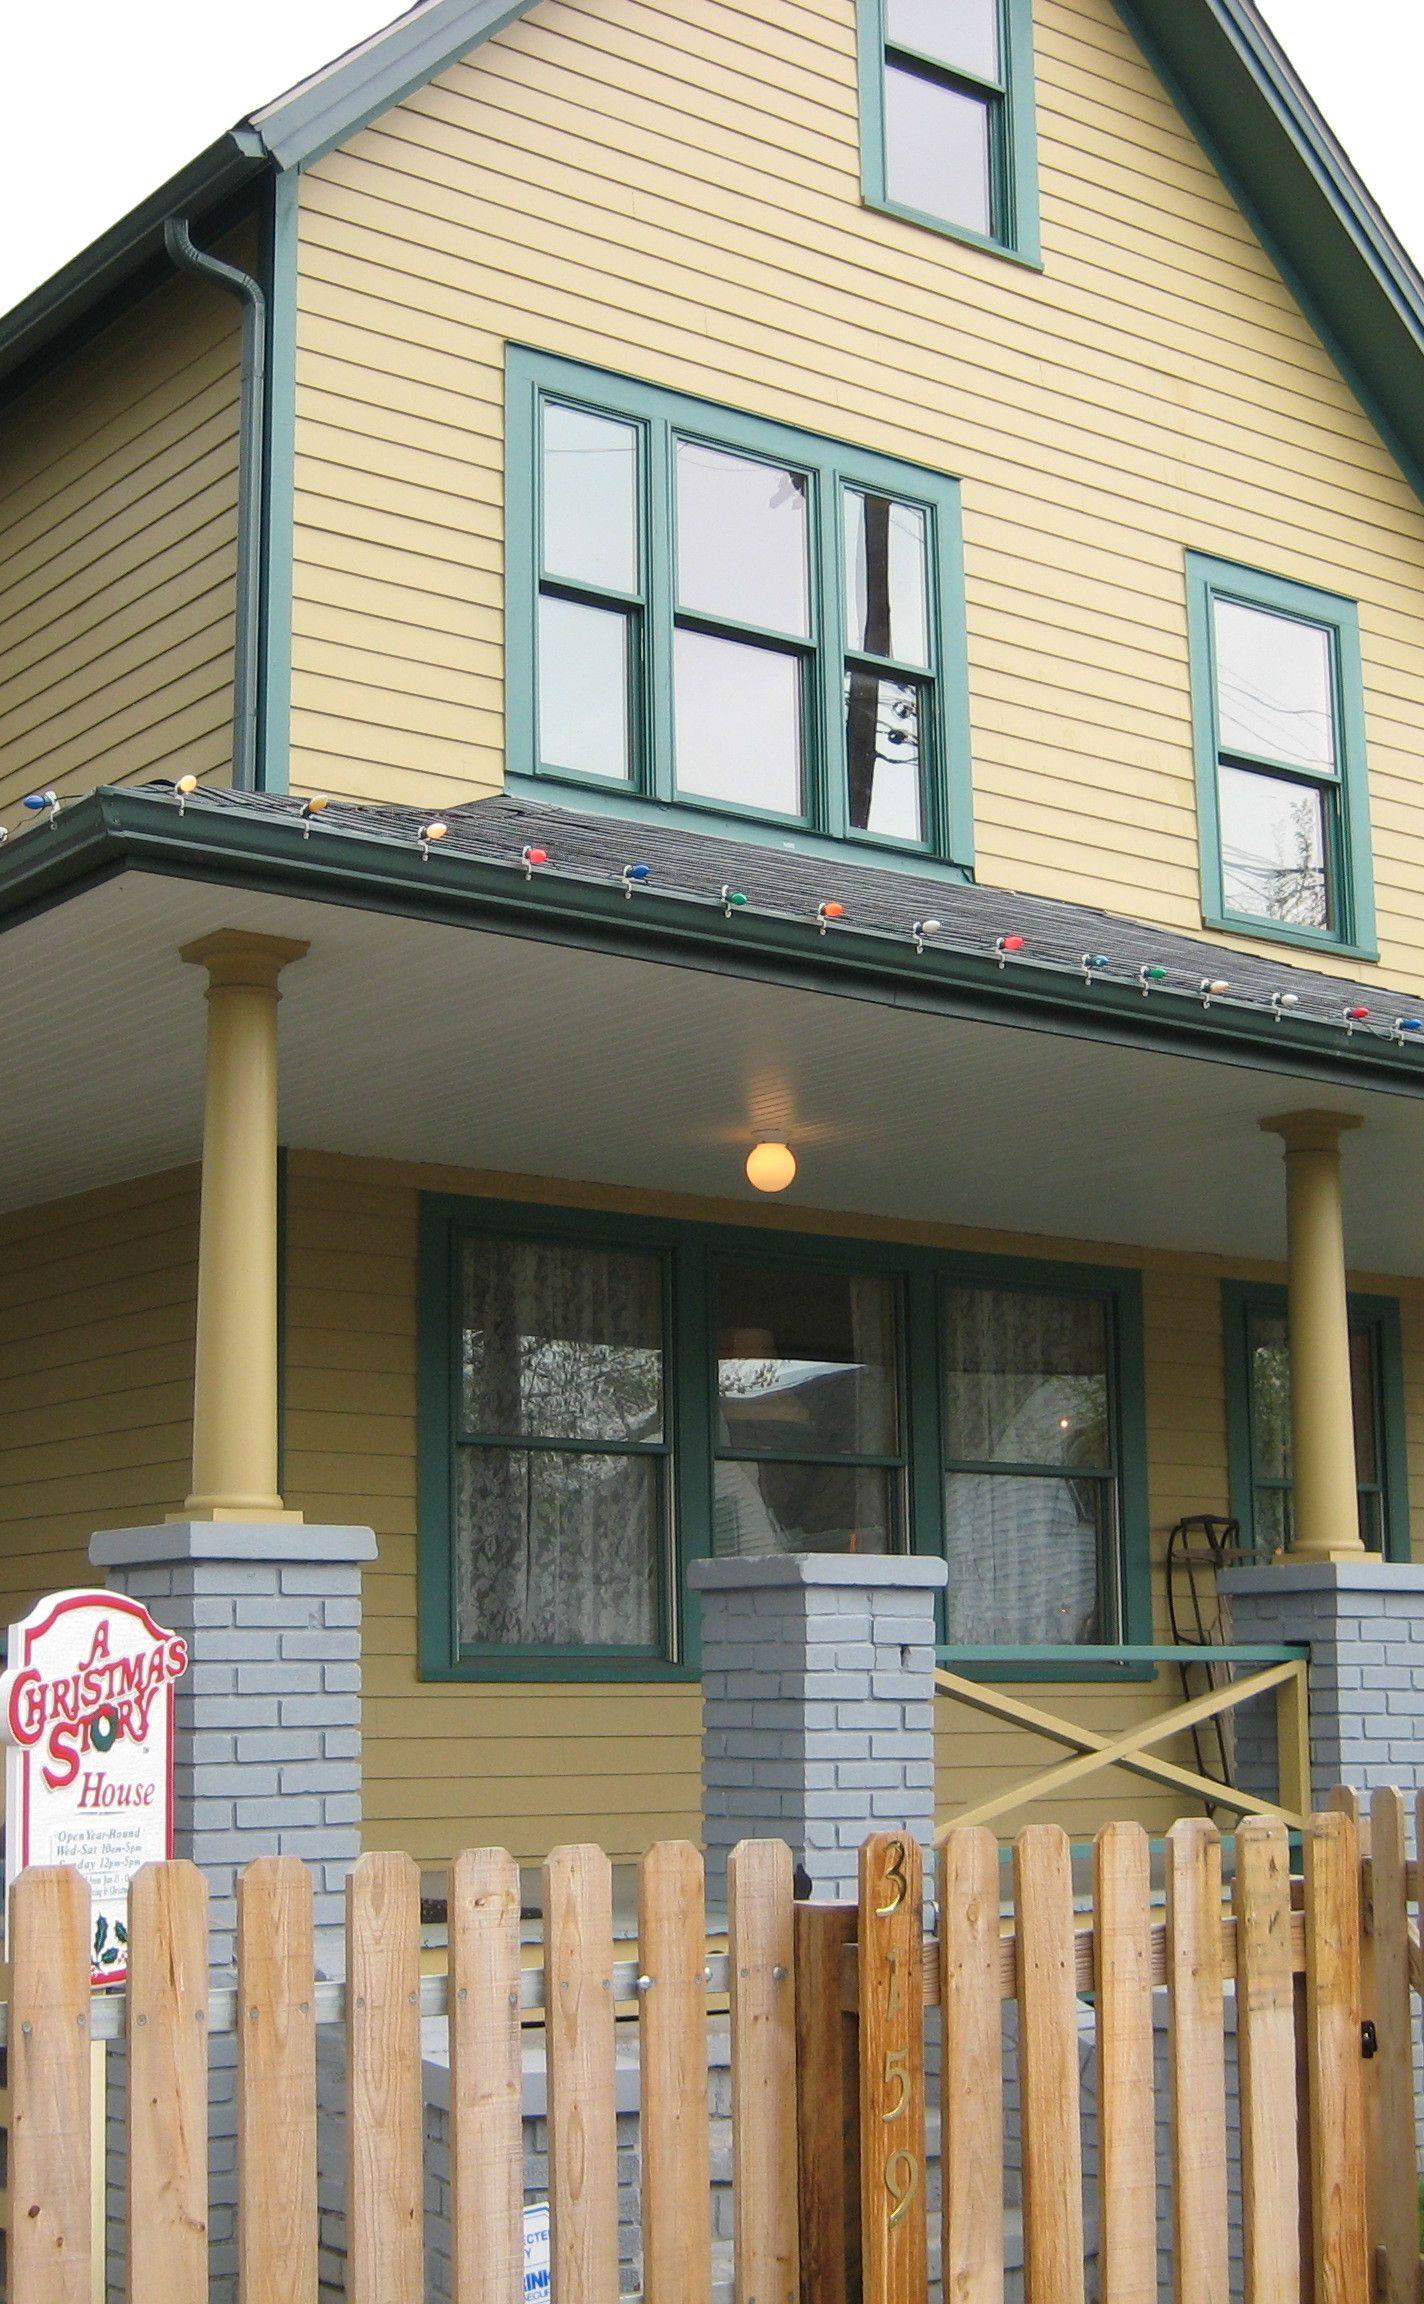 A Christmas Story House and Museum Christmas story house